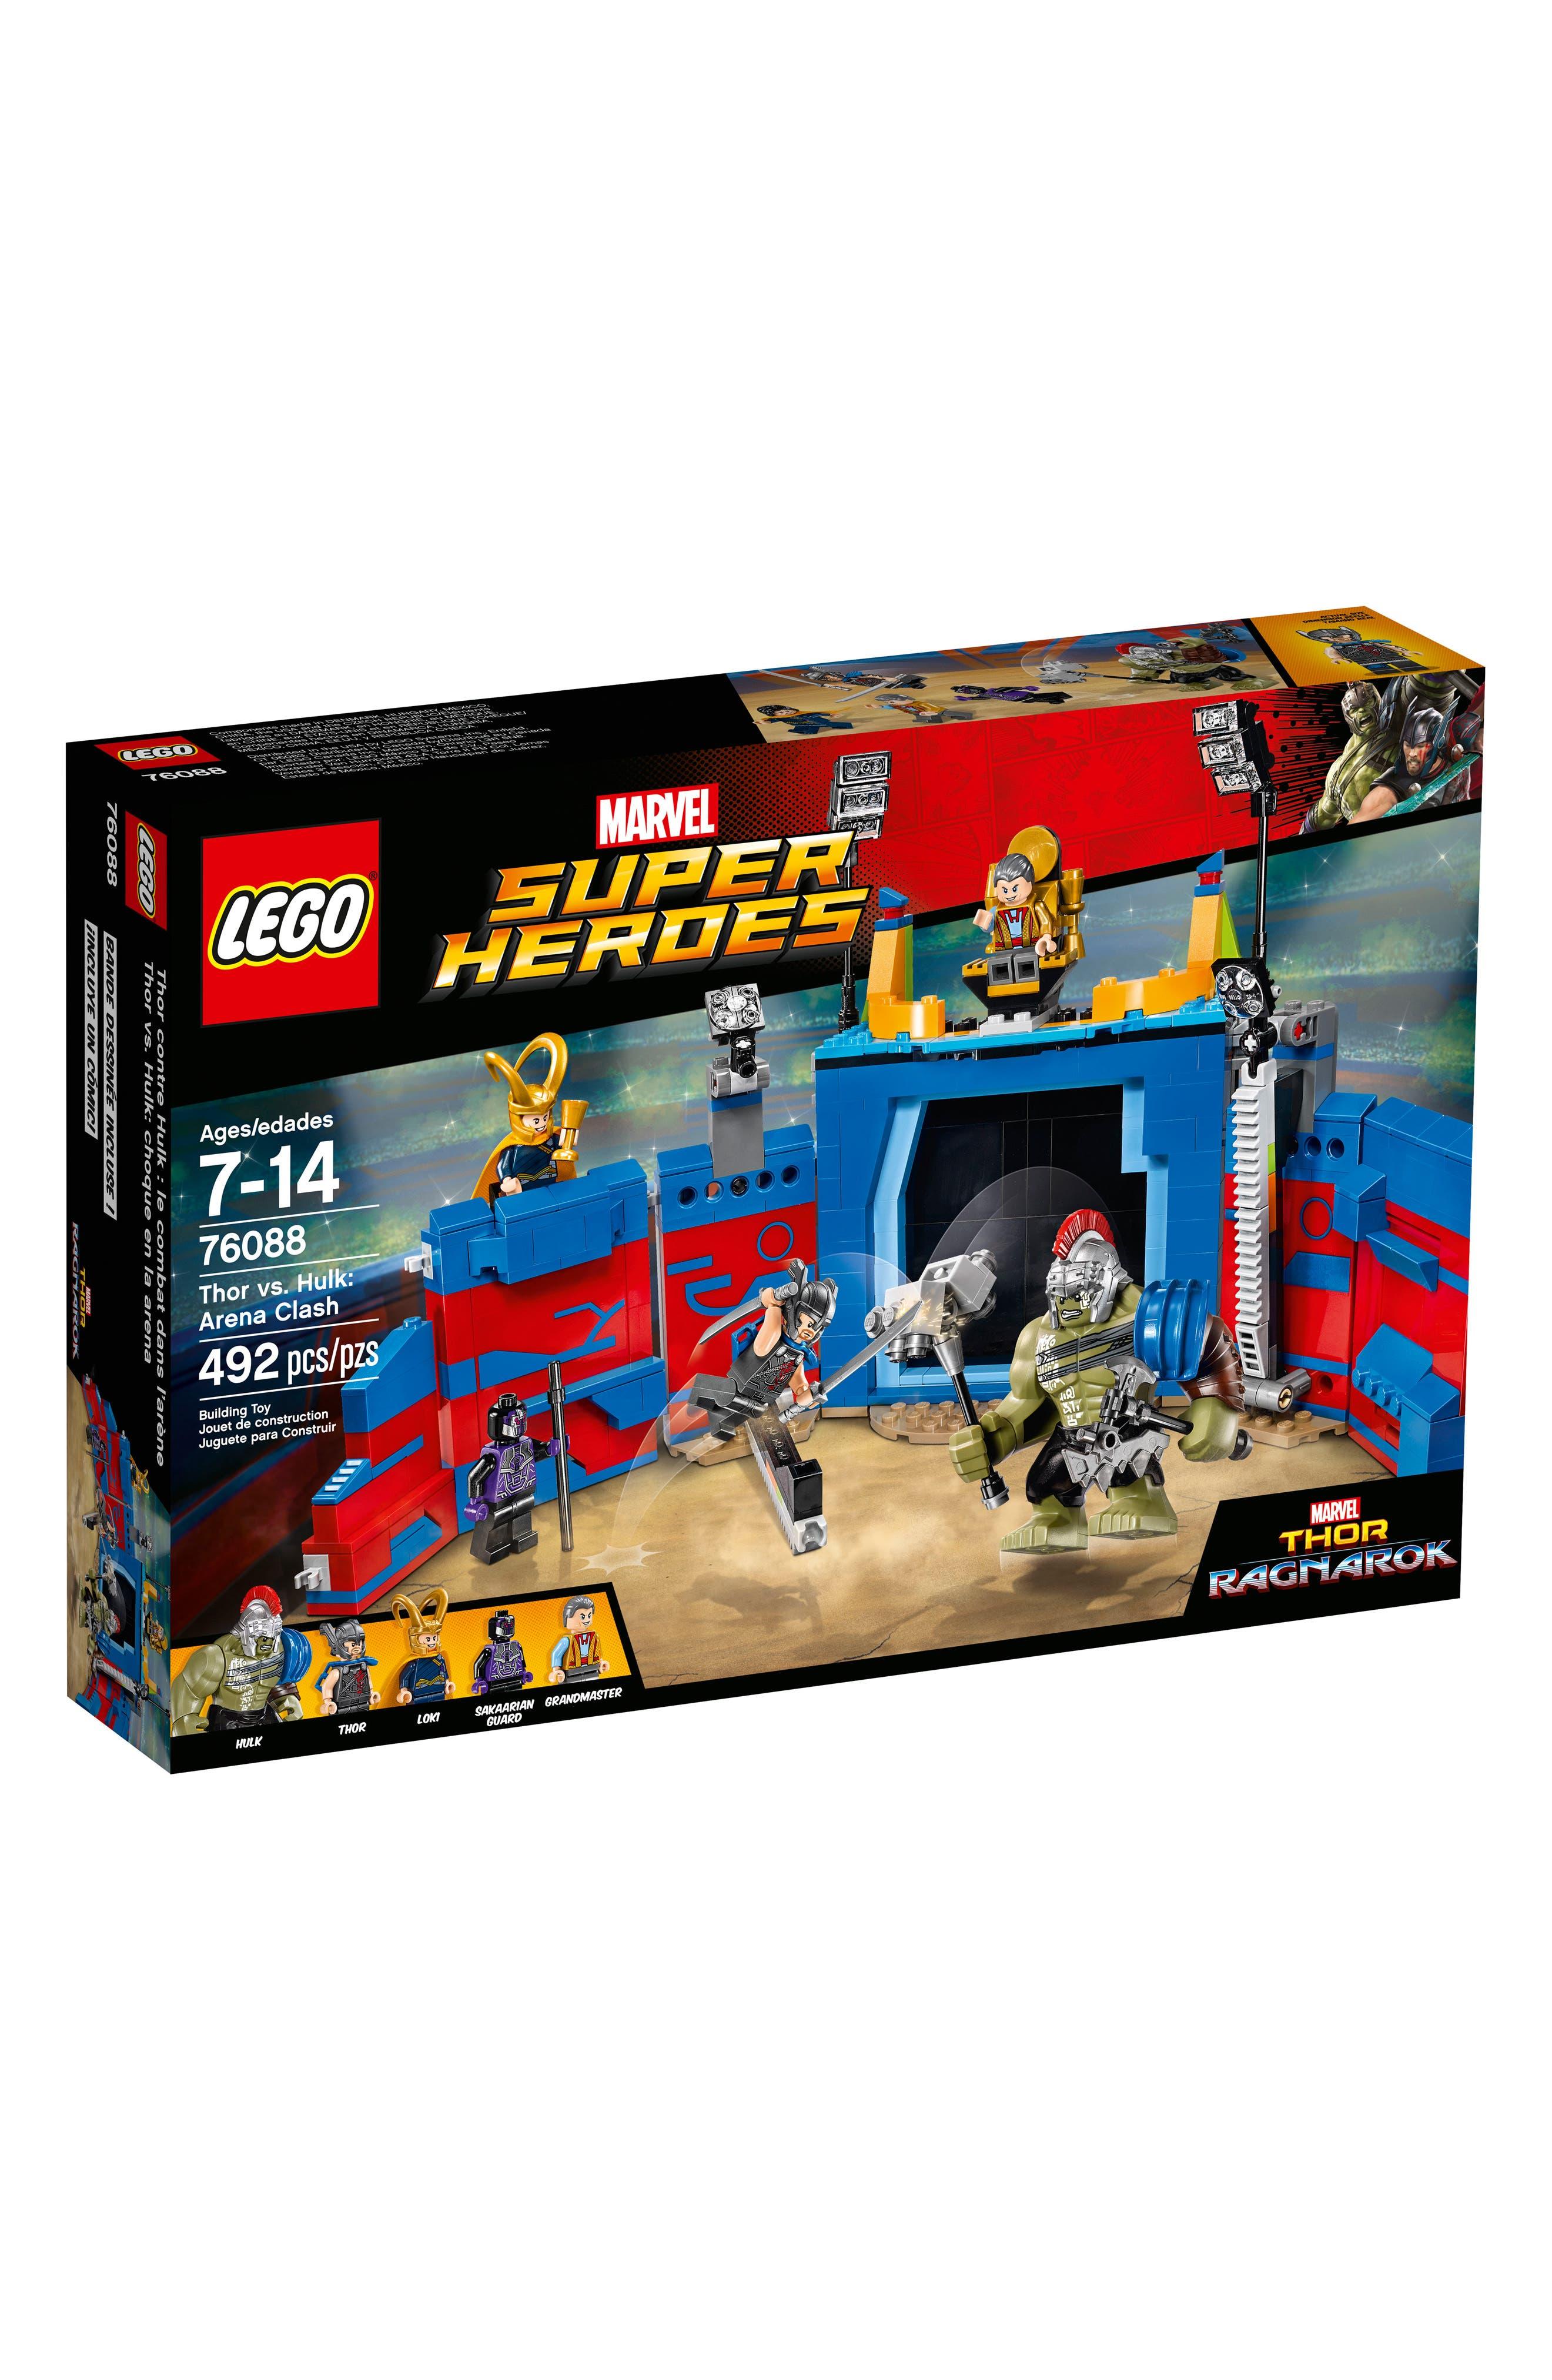 Marvel Super Heroes Thor vs. Hulk: Arena Clash Play Set - 76088,                         Main,                         color, Multi